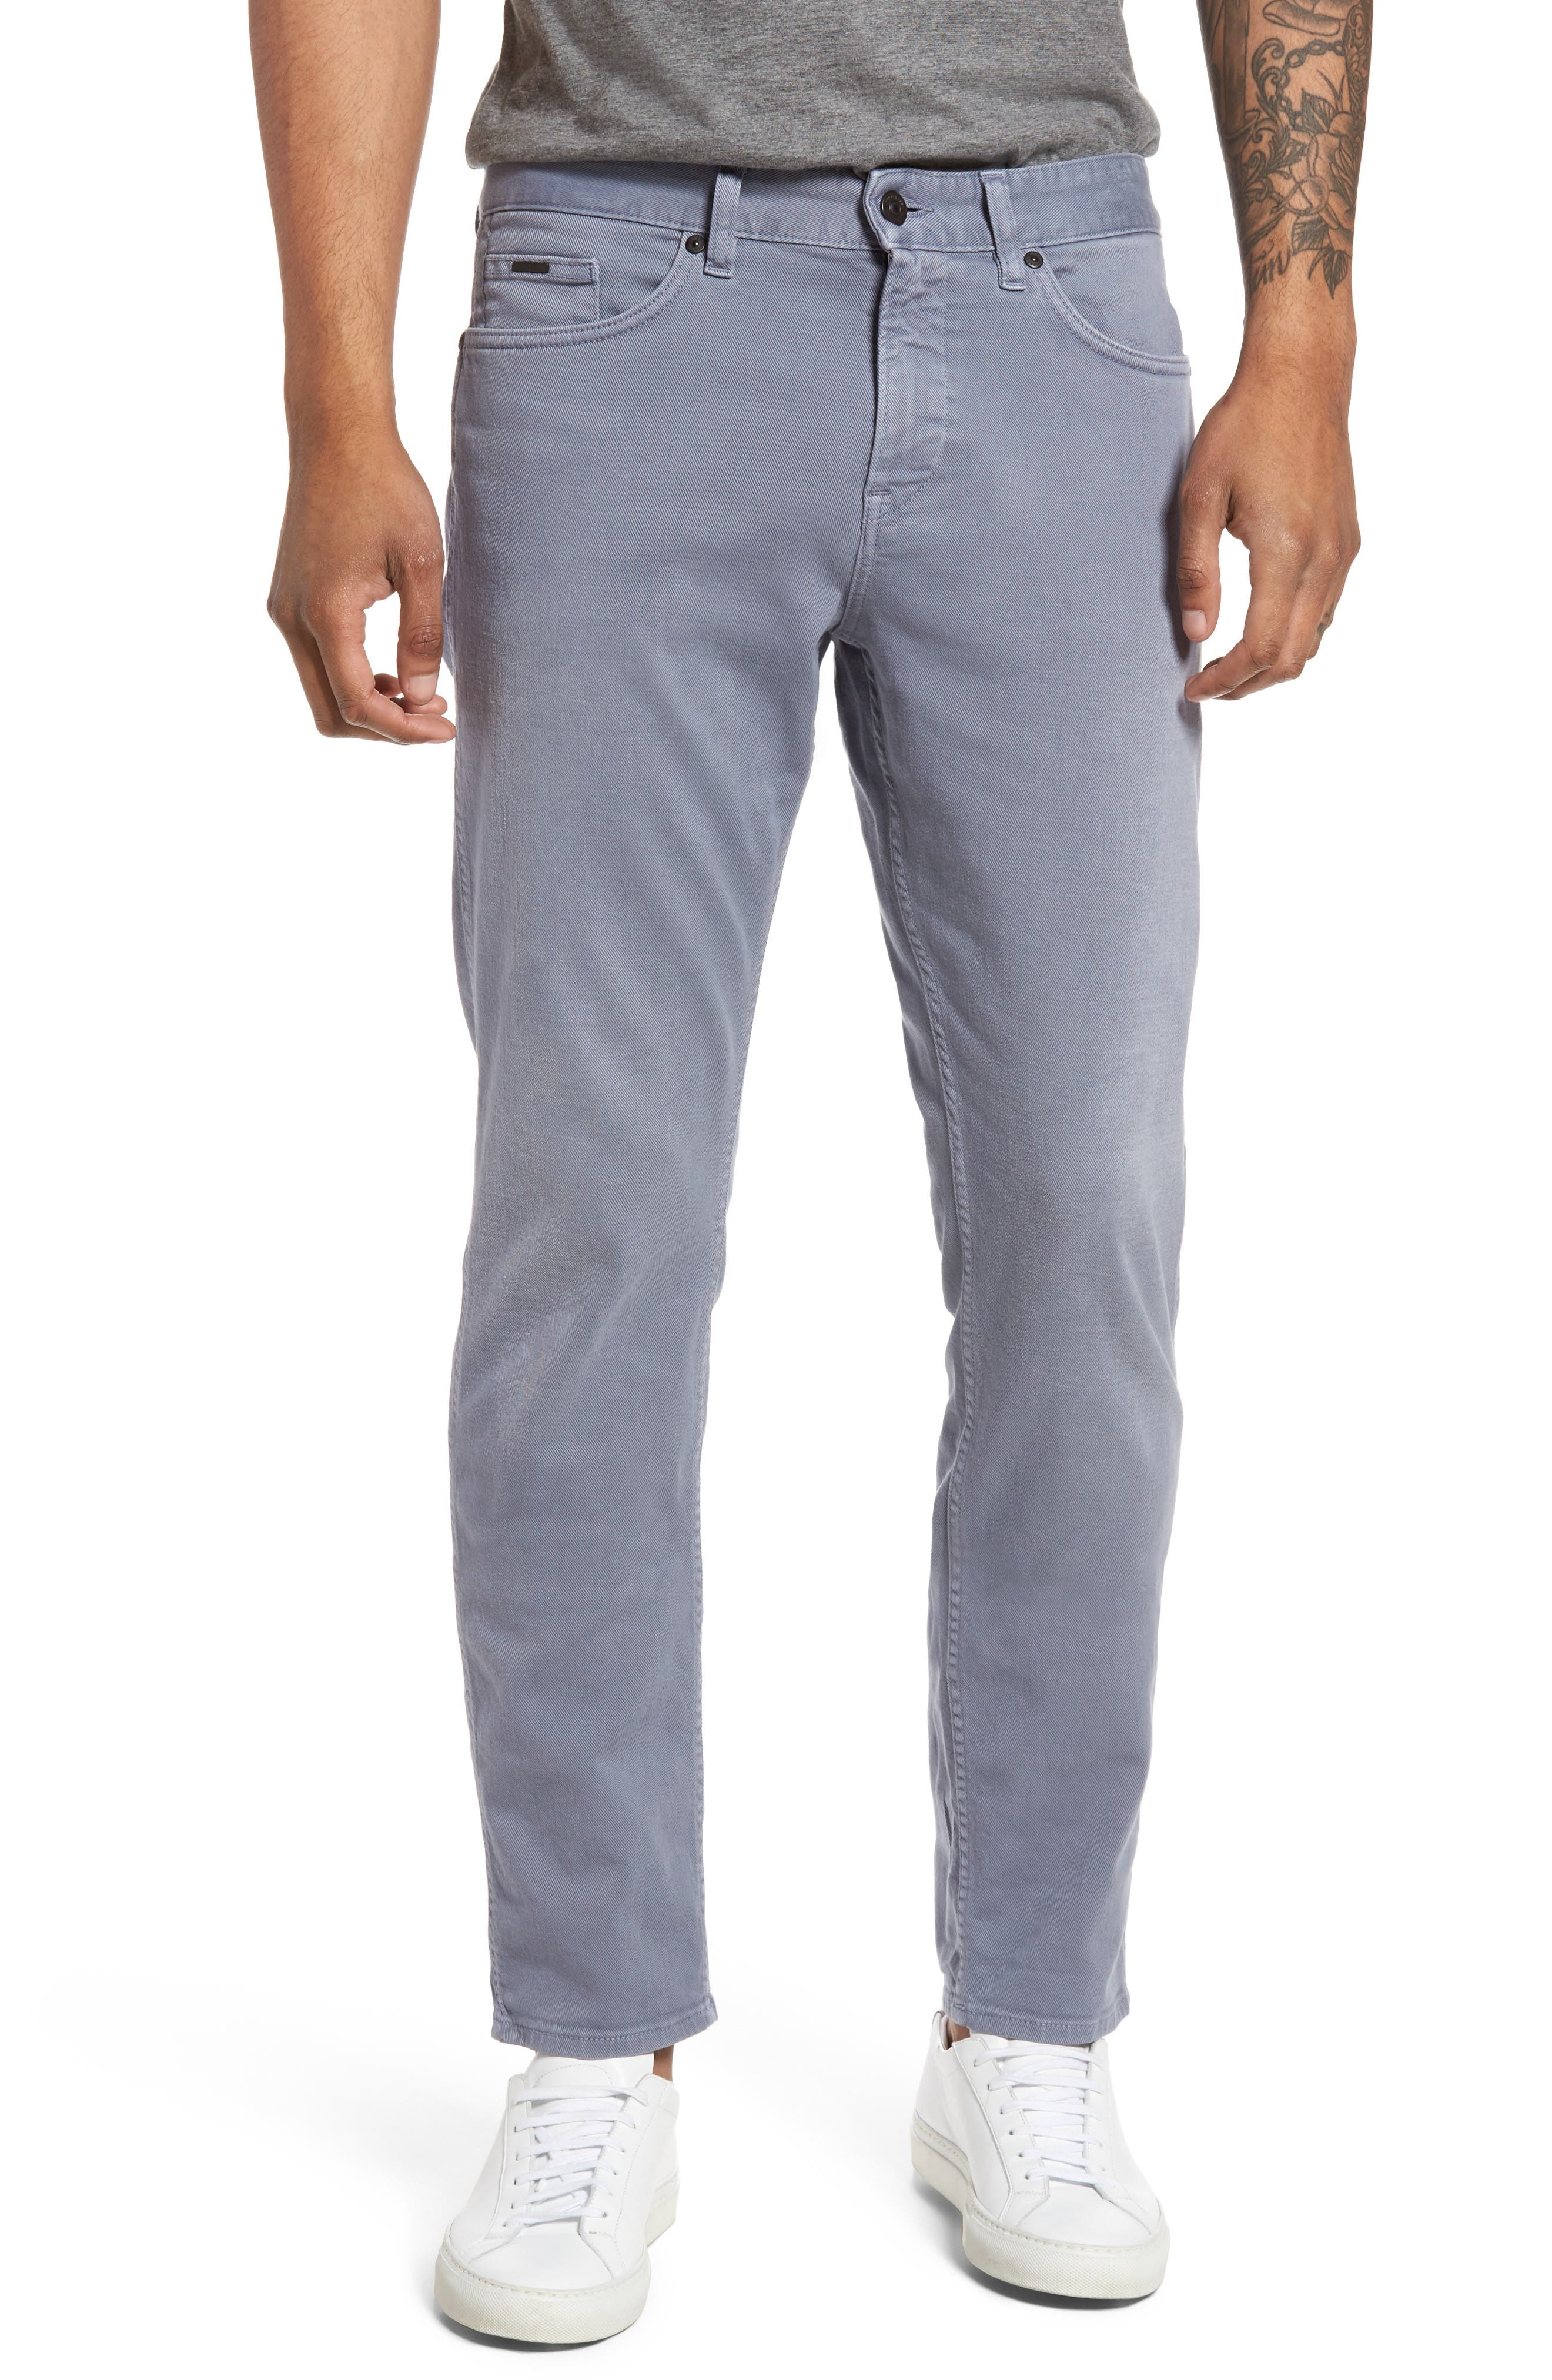 Delaware Slim Fit Jeans,                             Main thumbnail 1, color,                             462